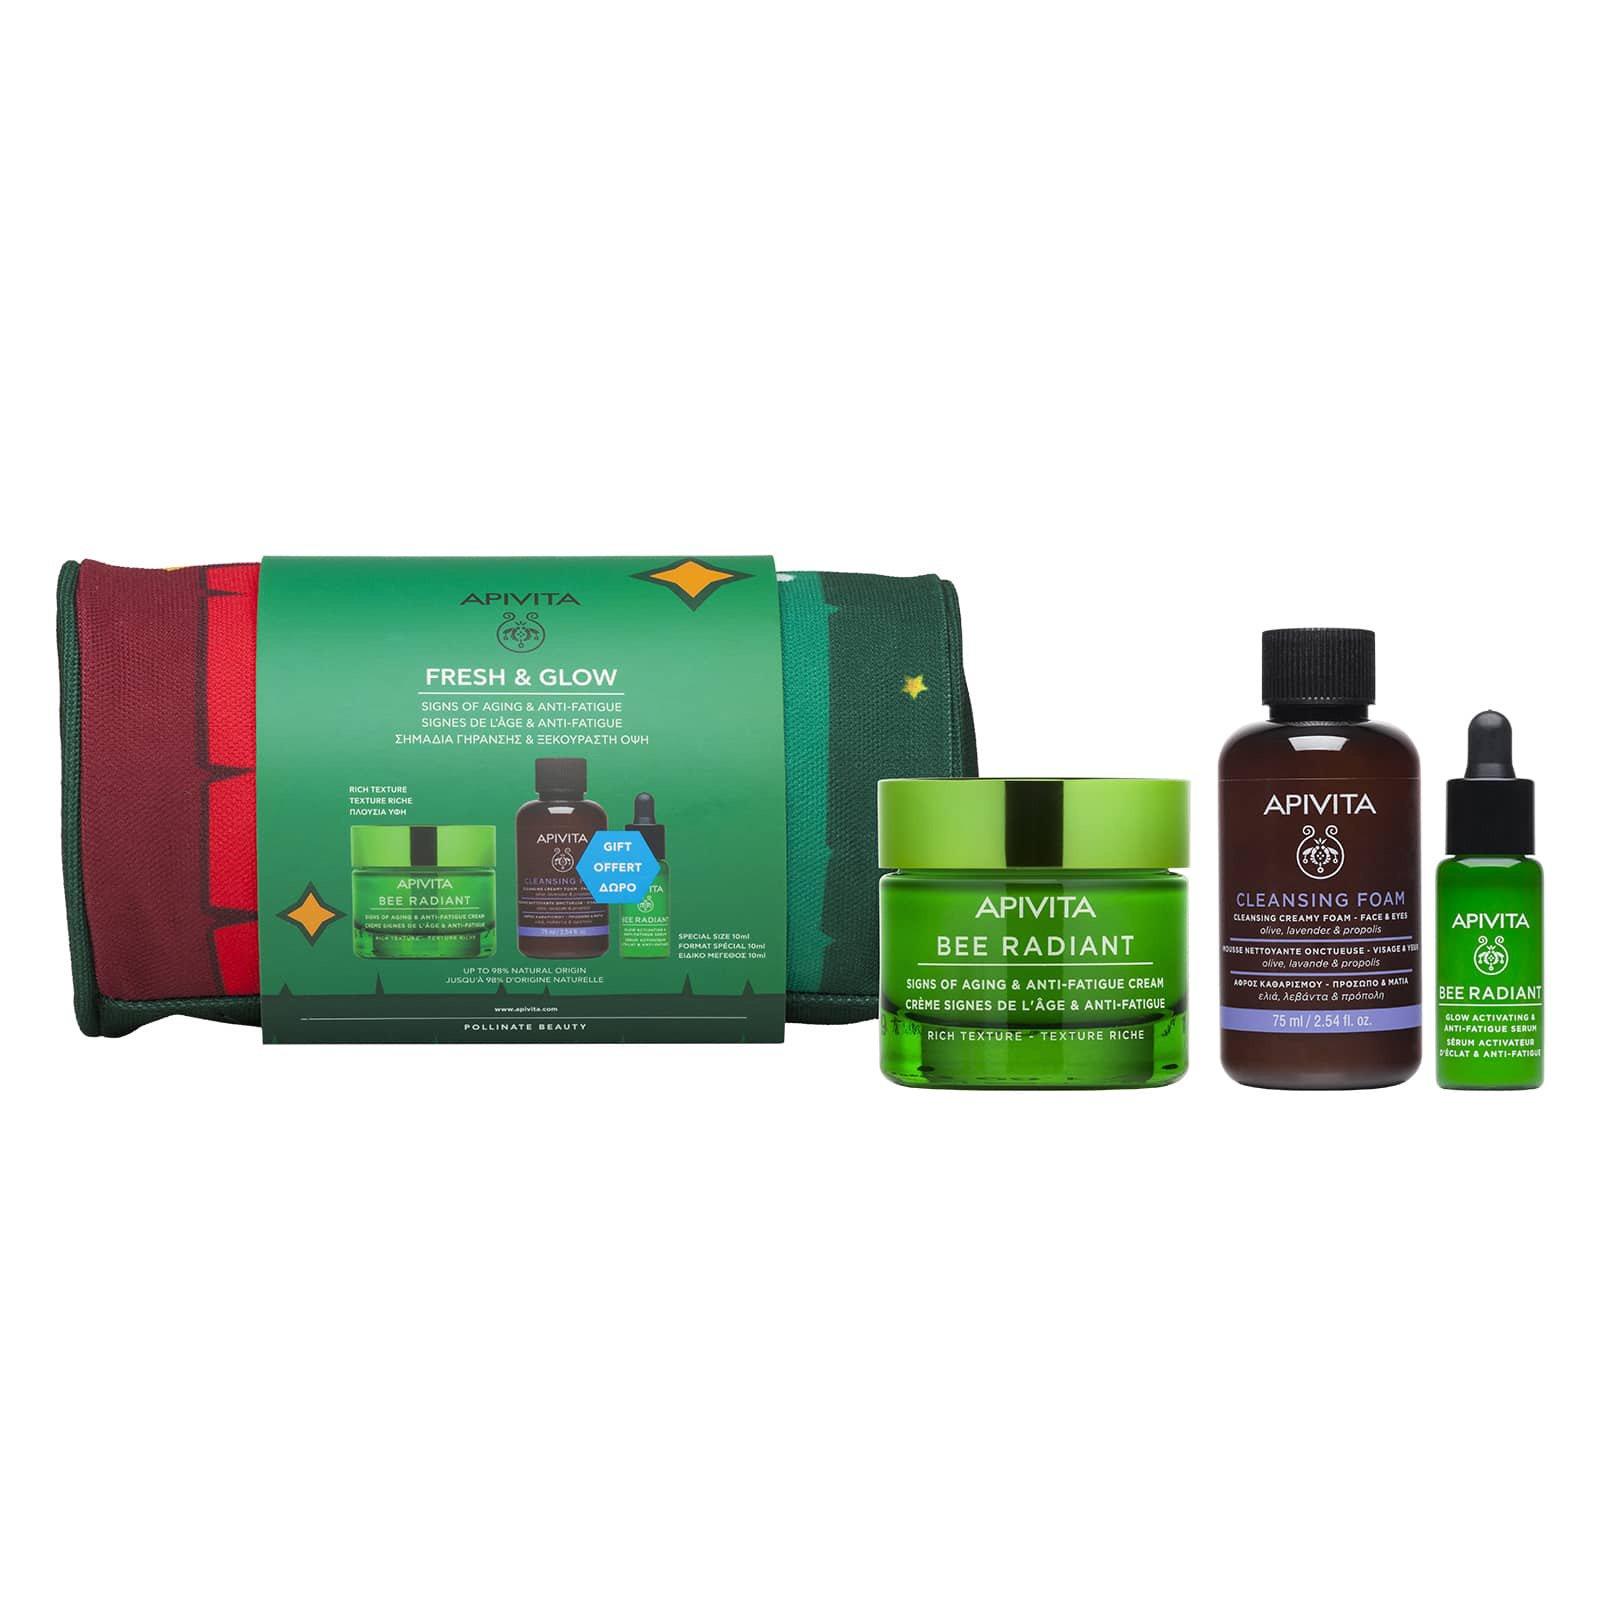 Apivita Promo Bee Radiant Rich Cream 50ml & Δώρο Cleansing Foam Face & Eyes 75ml, Bee Radiant Glow Activating Serum 10ml